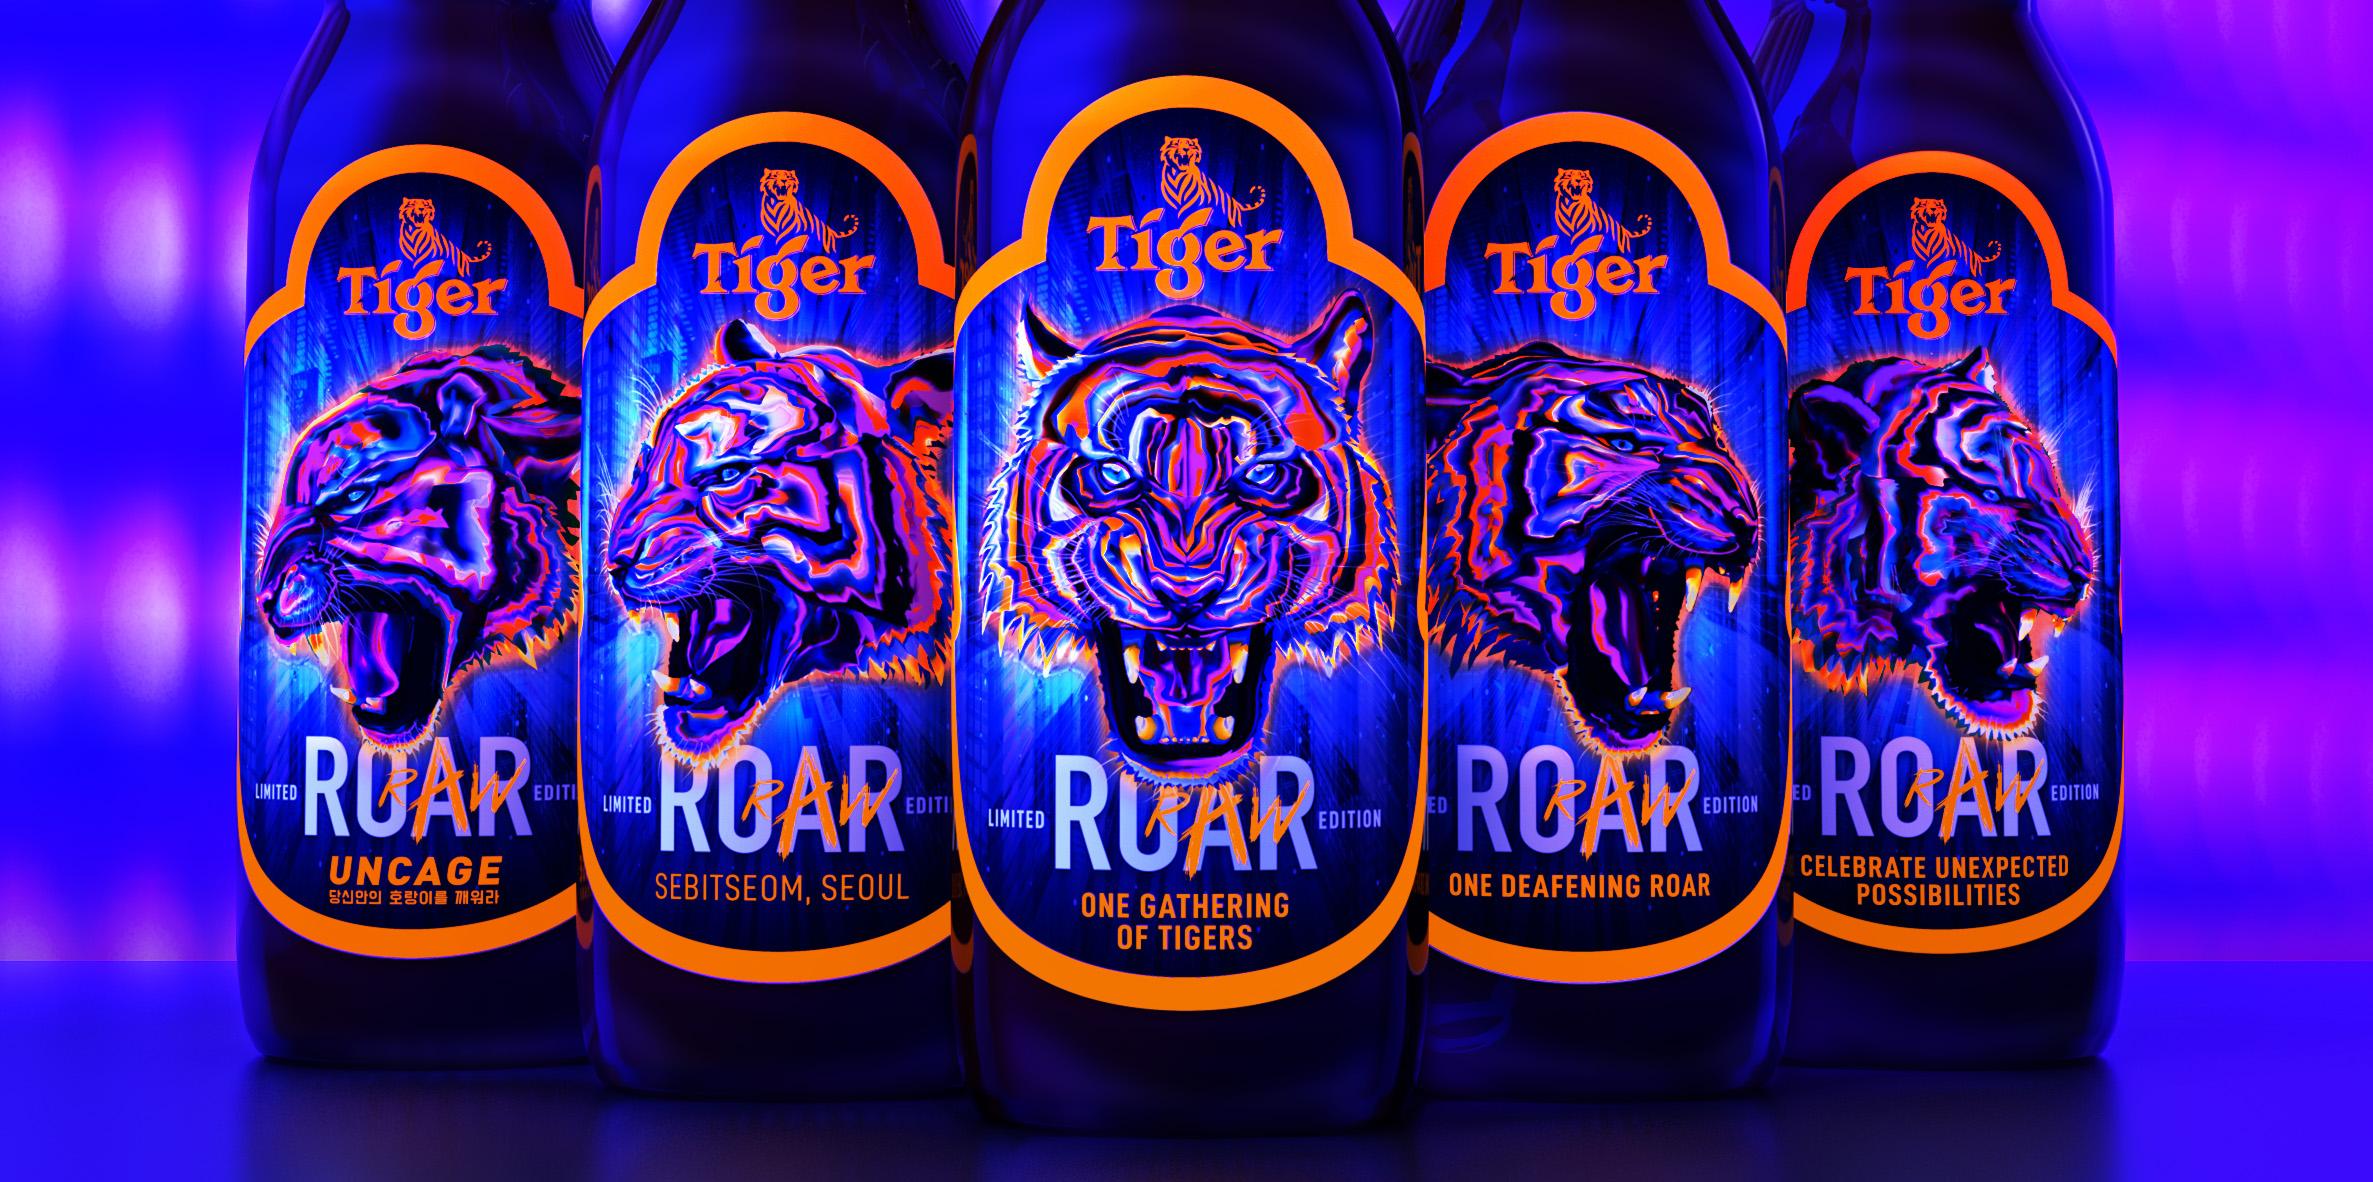 TigerRoar_003_220619.jpg